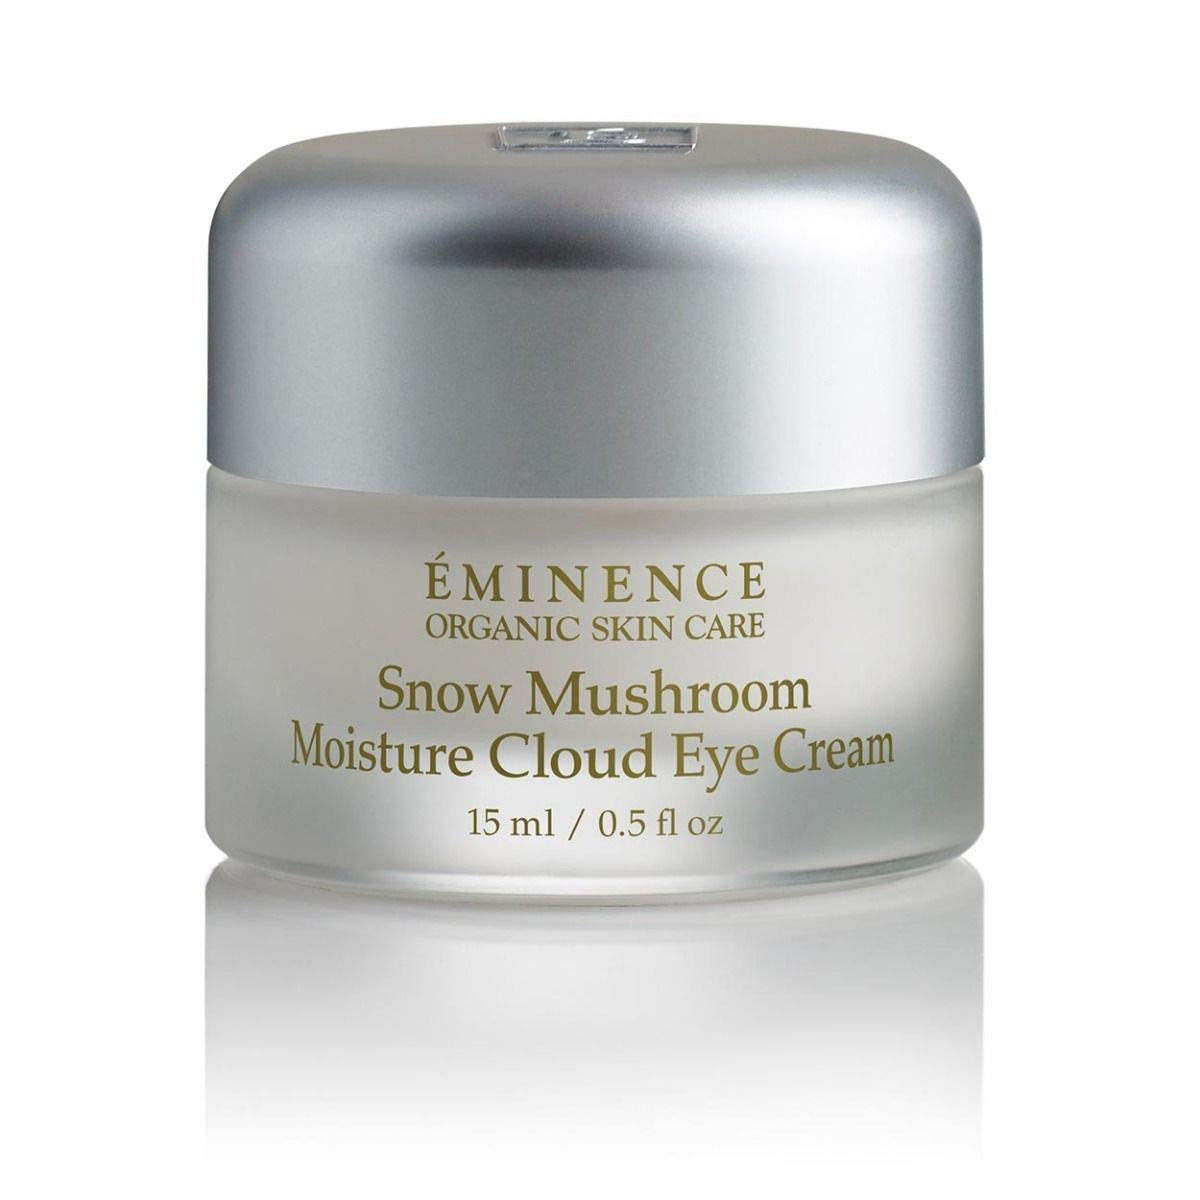 Eminence Organics Snow Mushroom Moisture Cloud Eye Cream 1 ounce